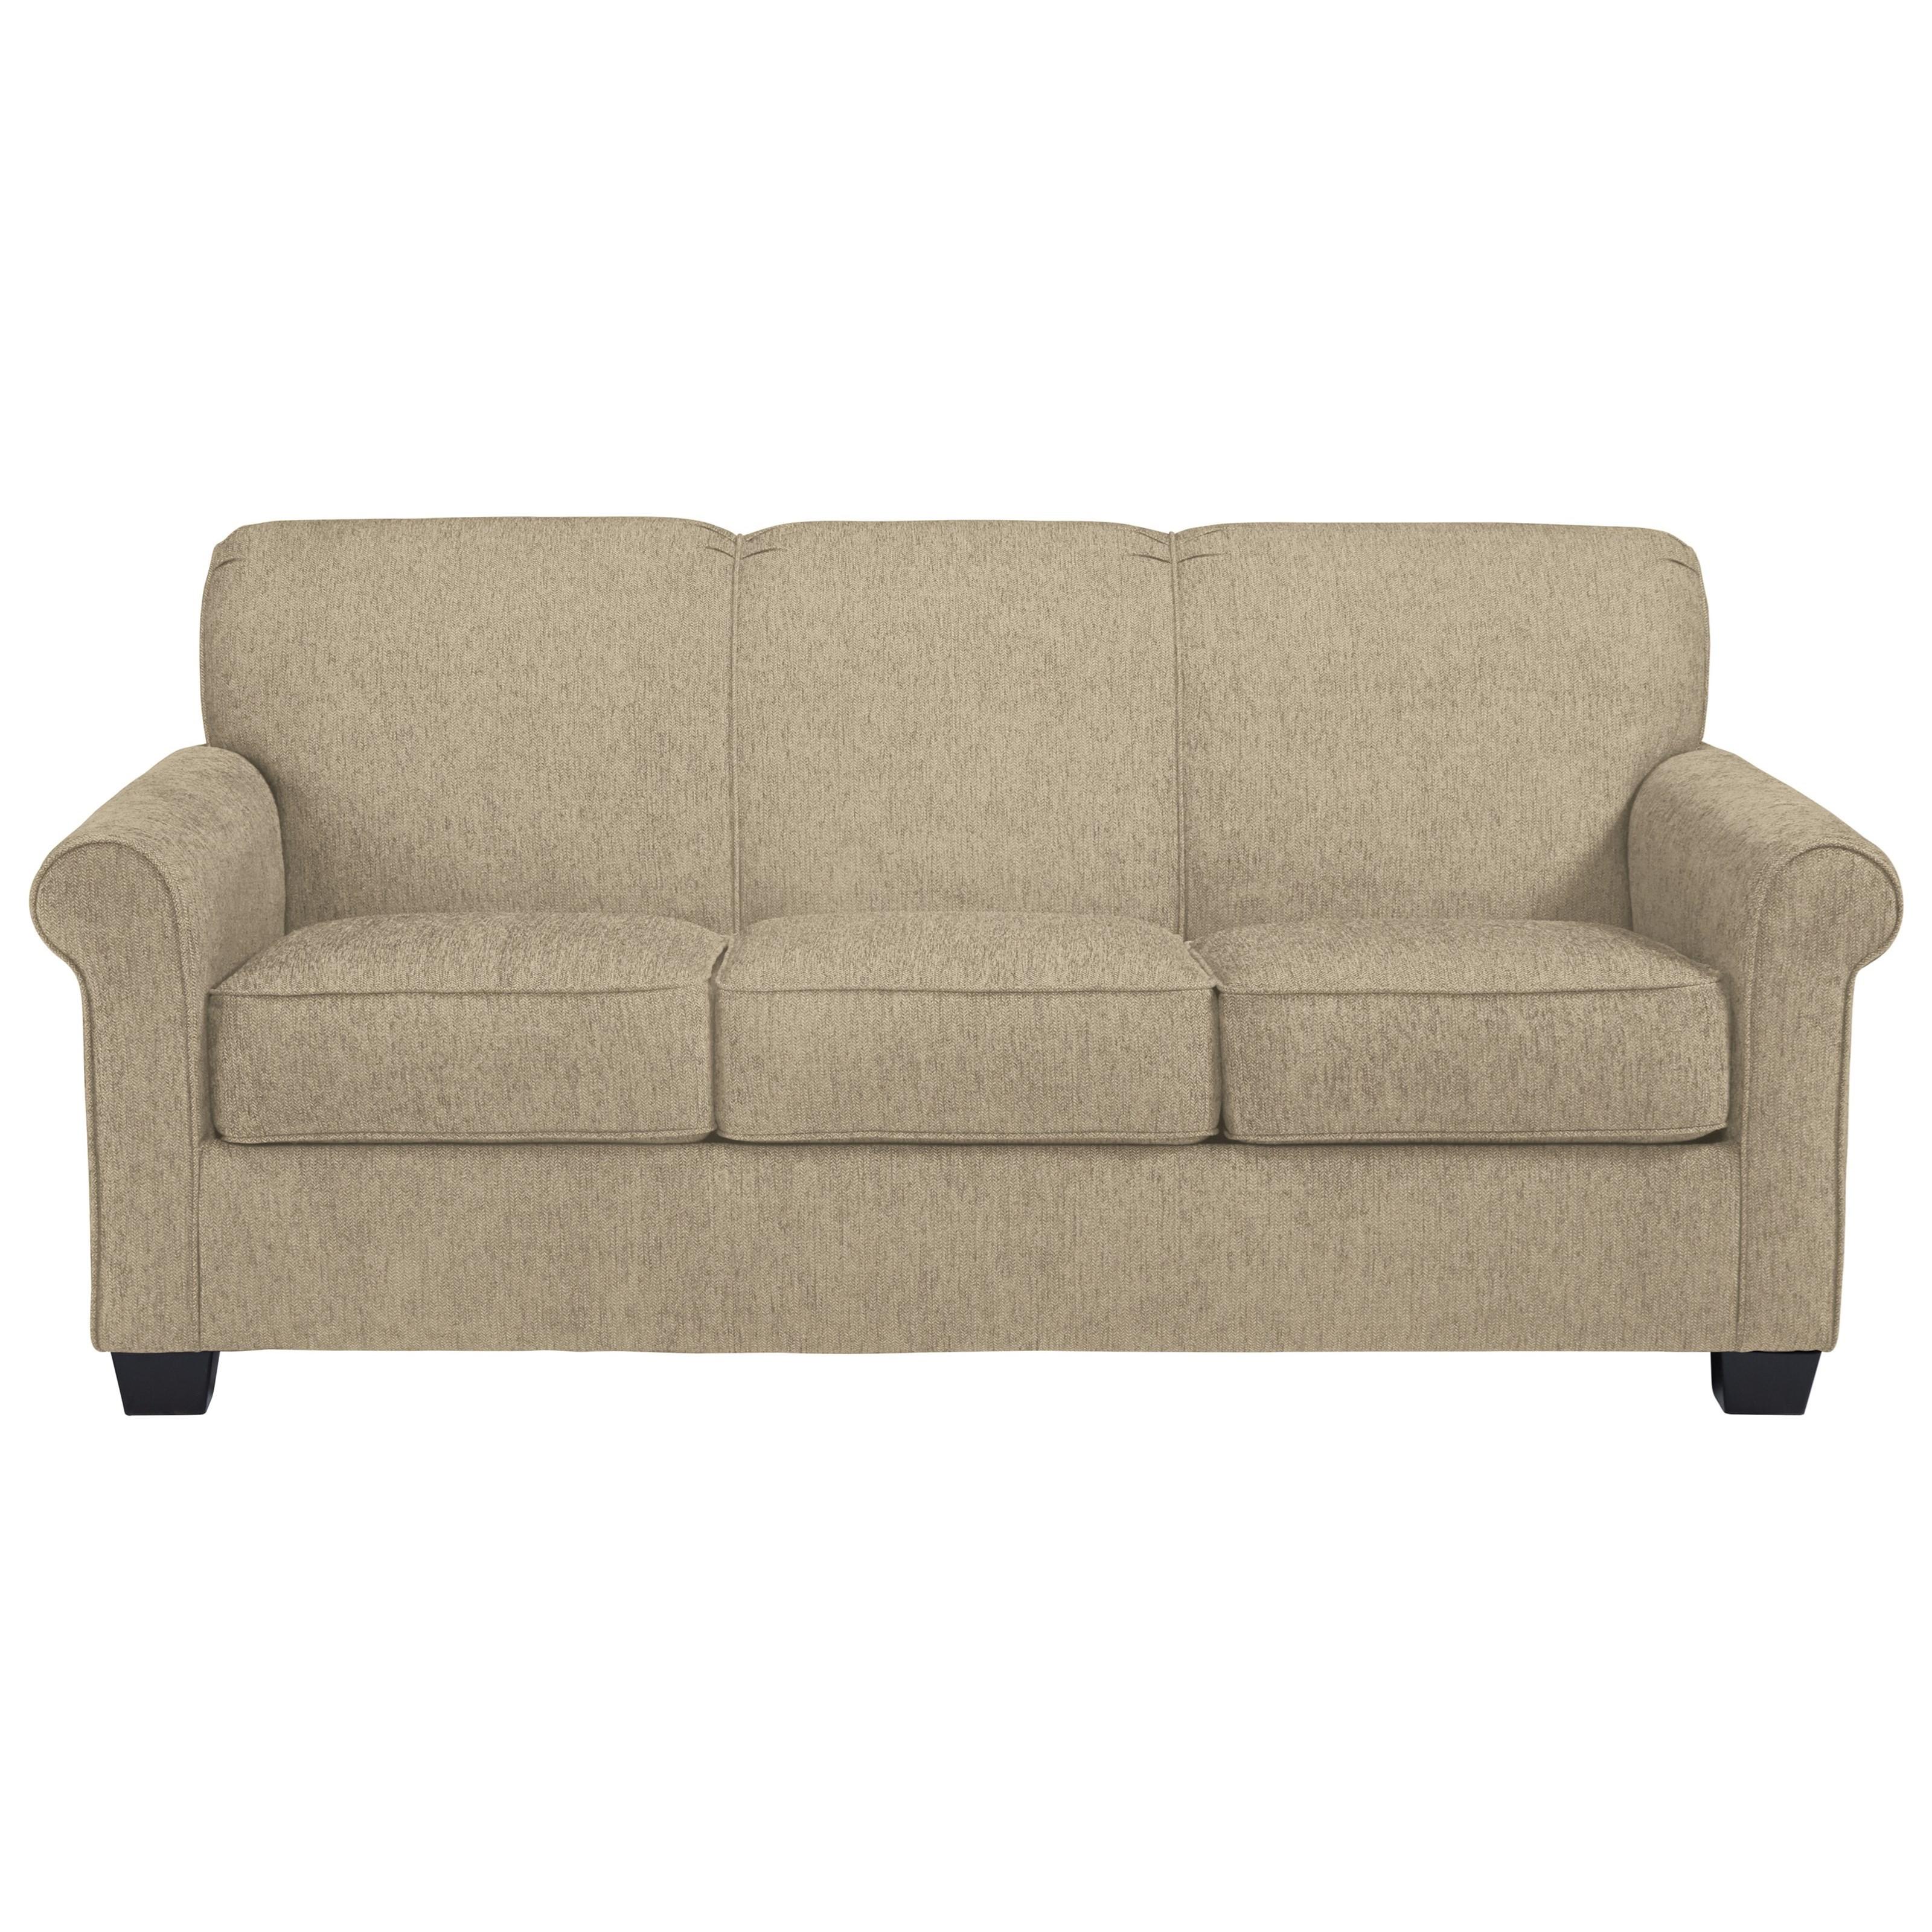 Signature Design by Ashley Cansler  Full Sofa Sleeper - Item Number: 7380936